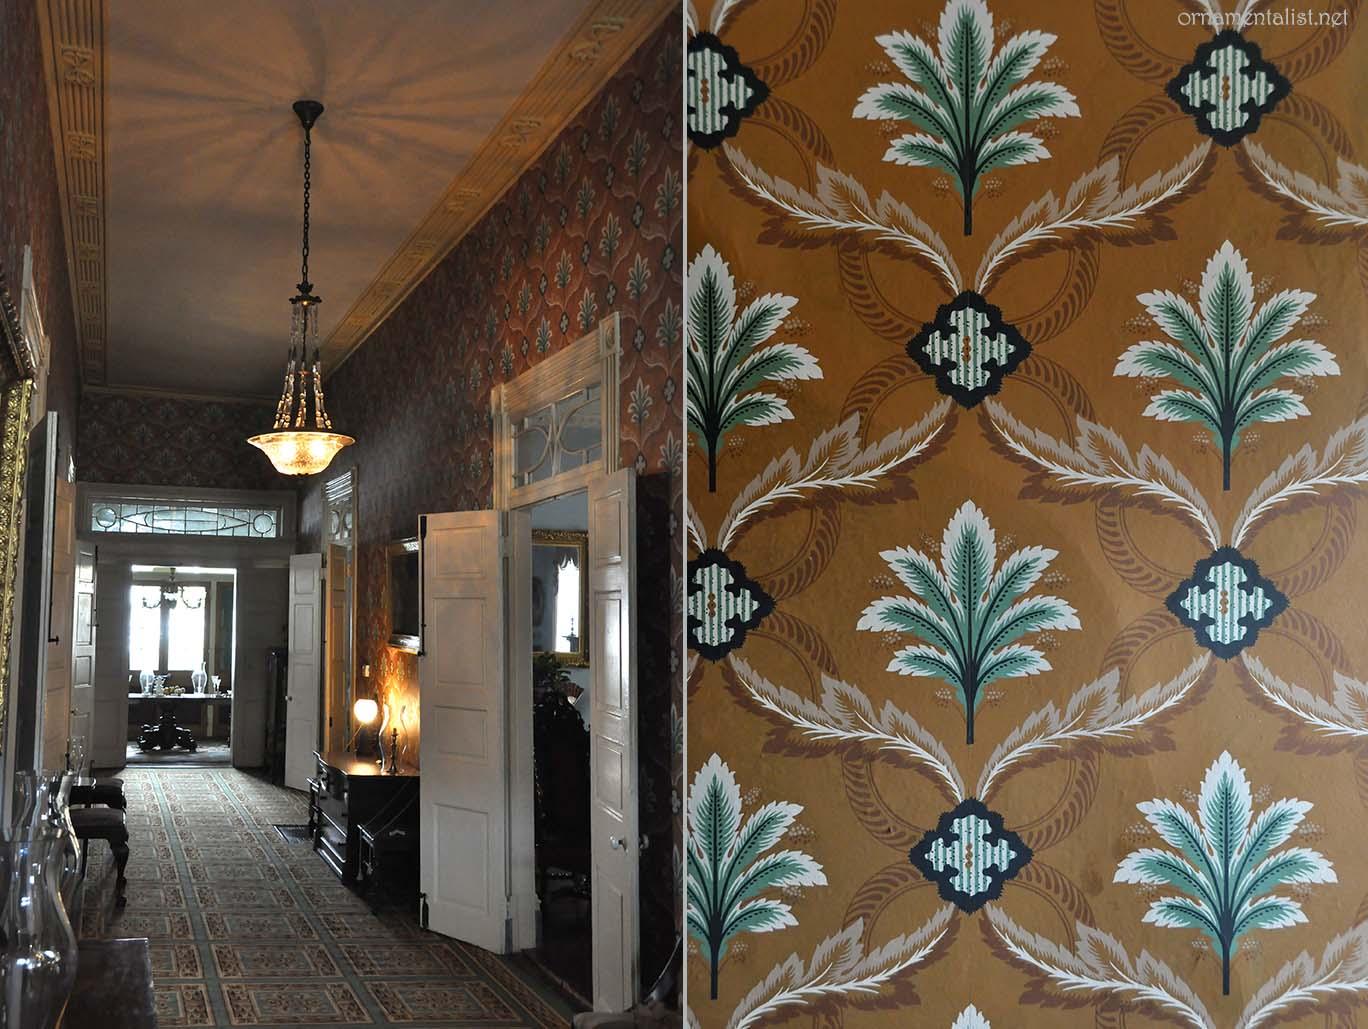 fabric wallpaper and furniture william morris reproduction wallpaper 1368x1029